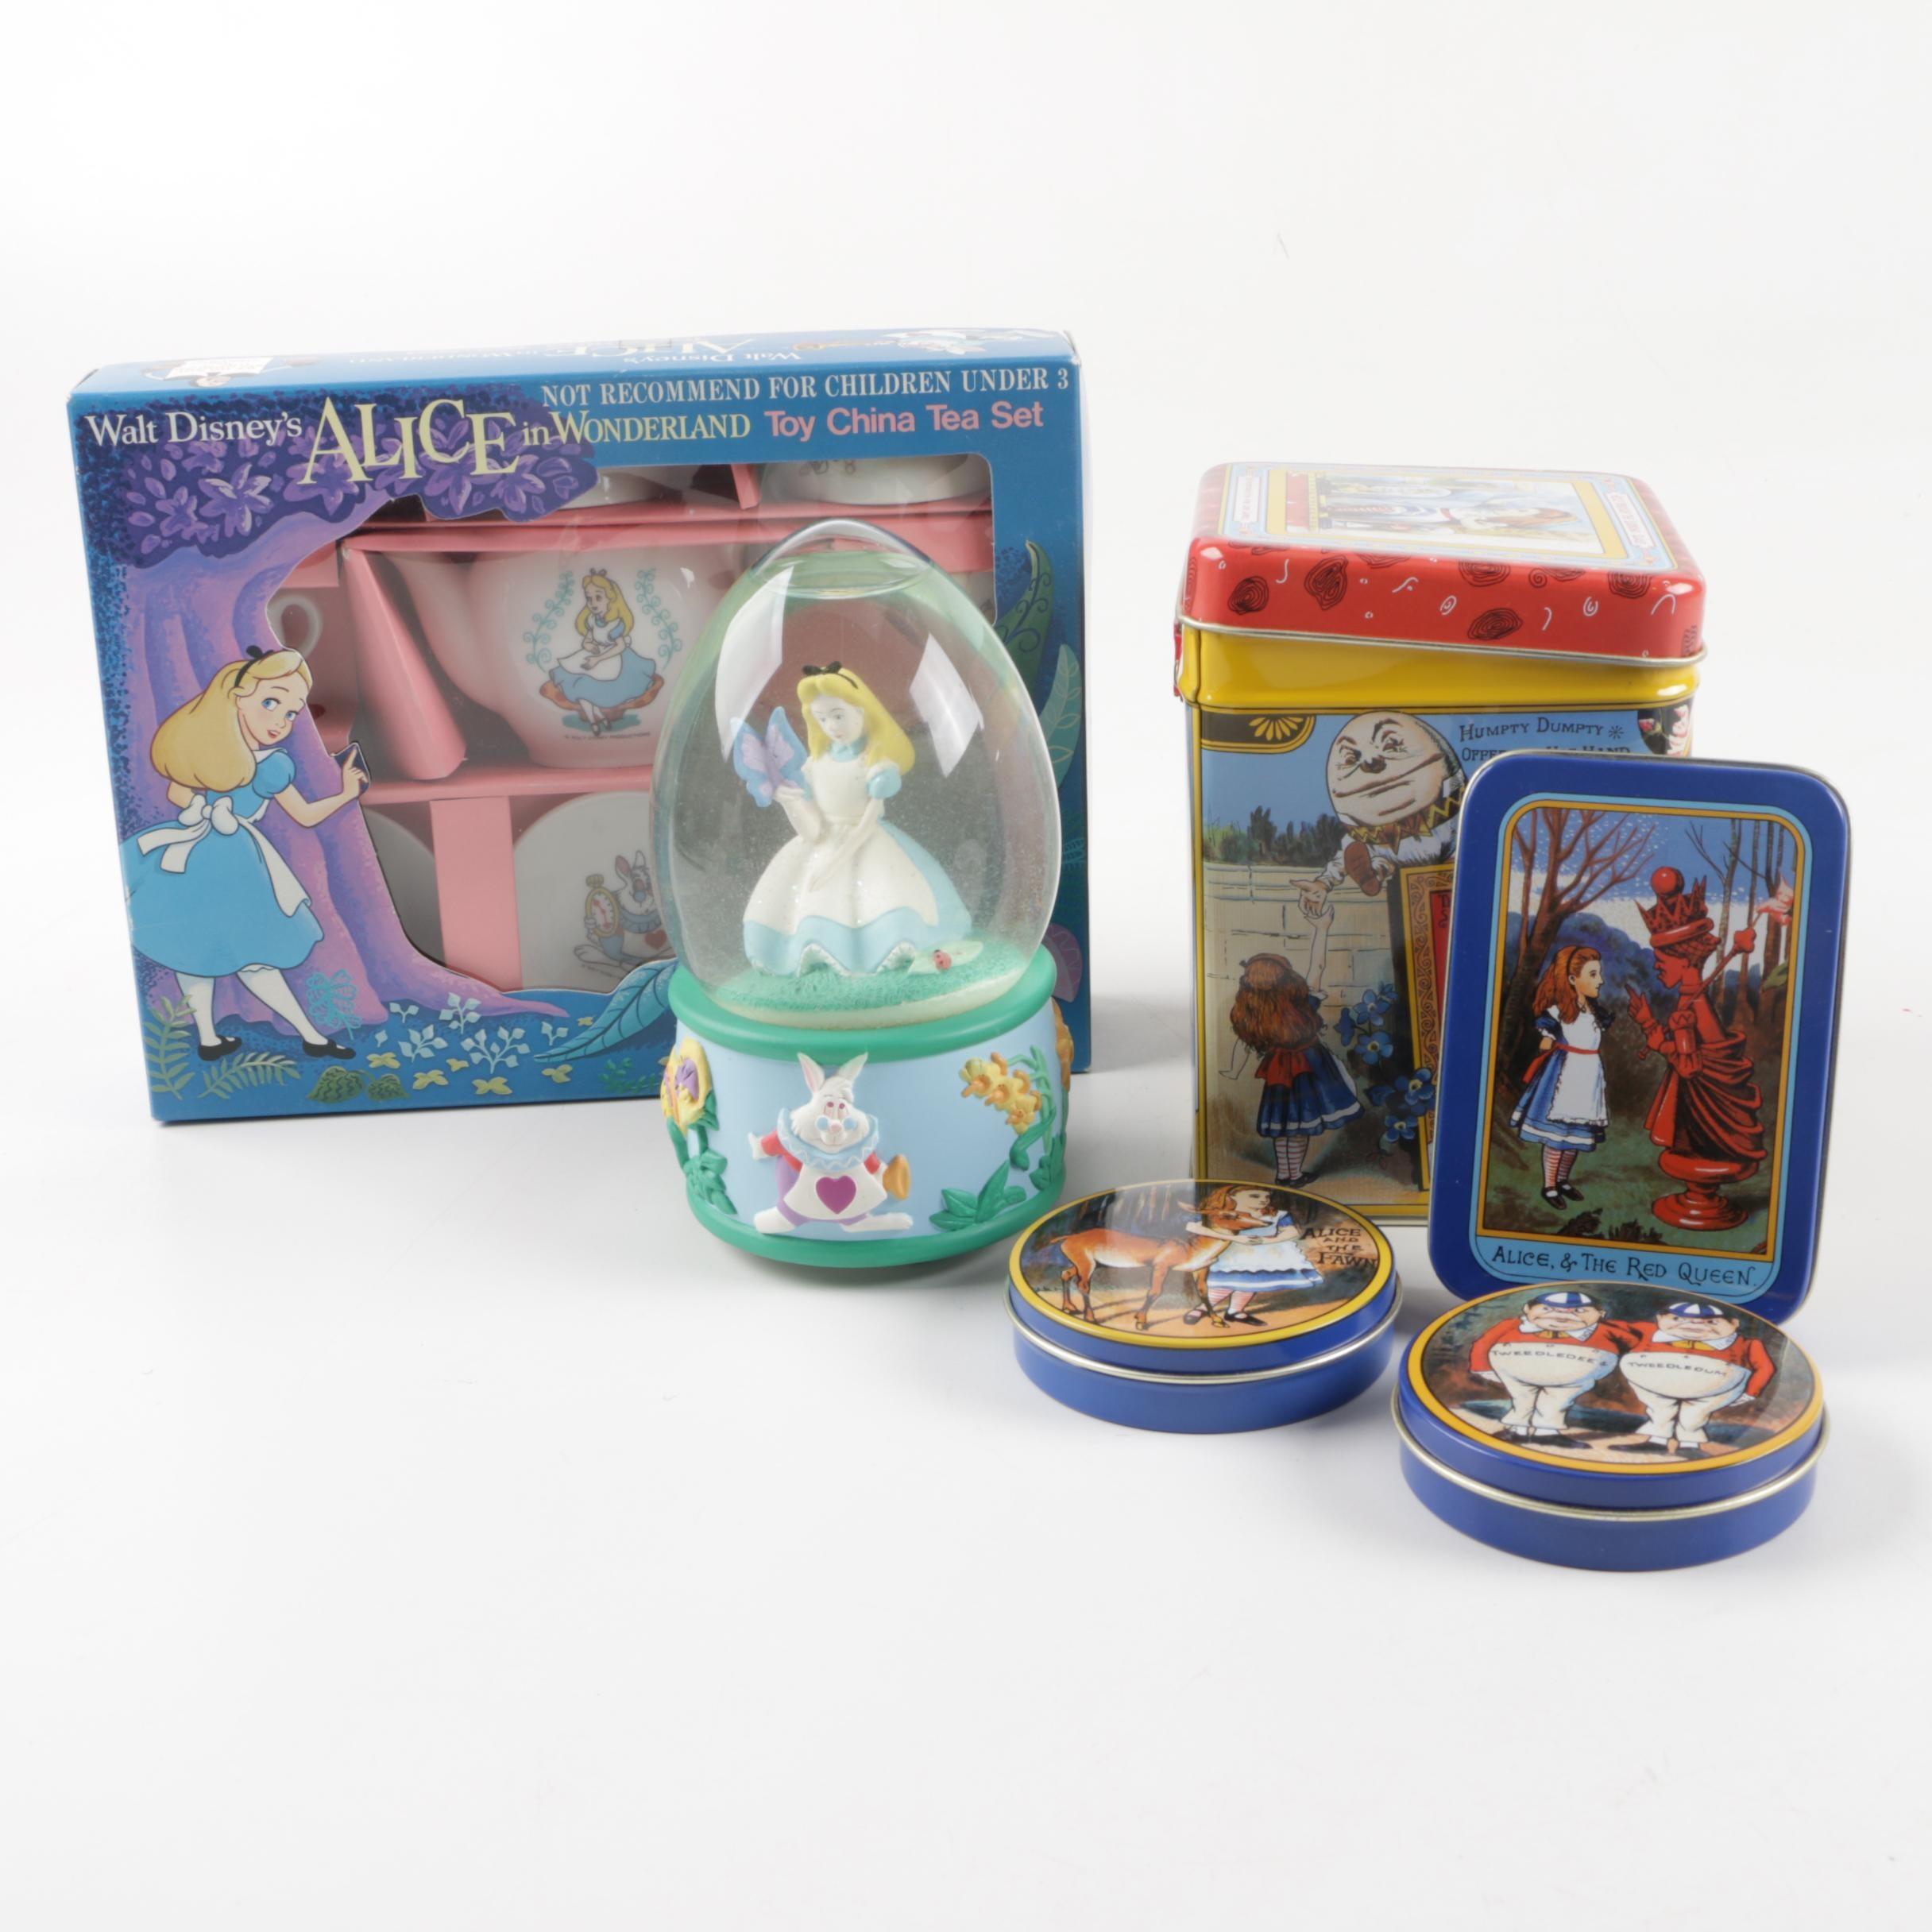 """Alice in Wonderland"" Decorative Tins, Snow Globe, and Tea Set"